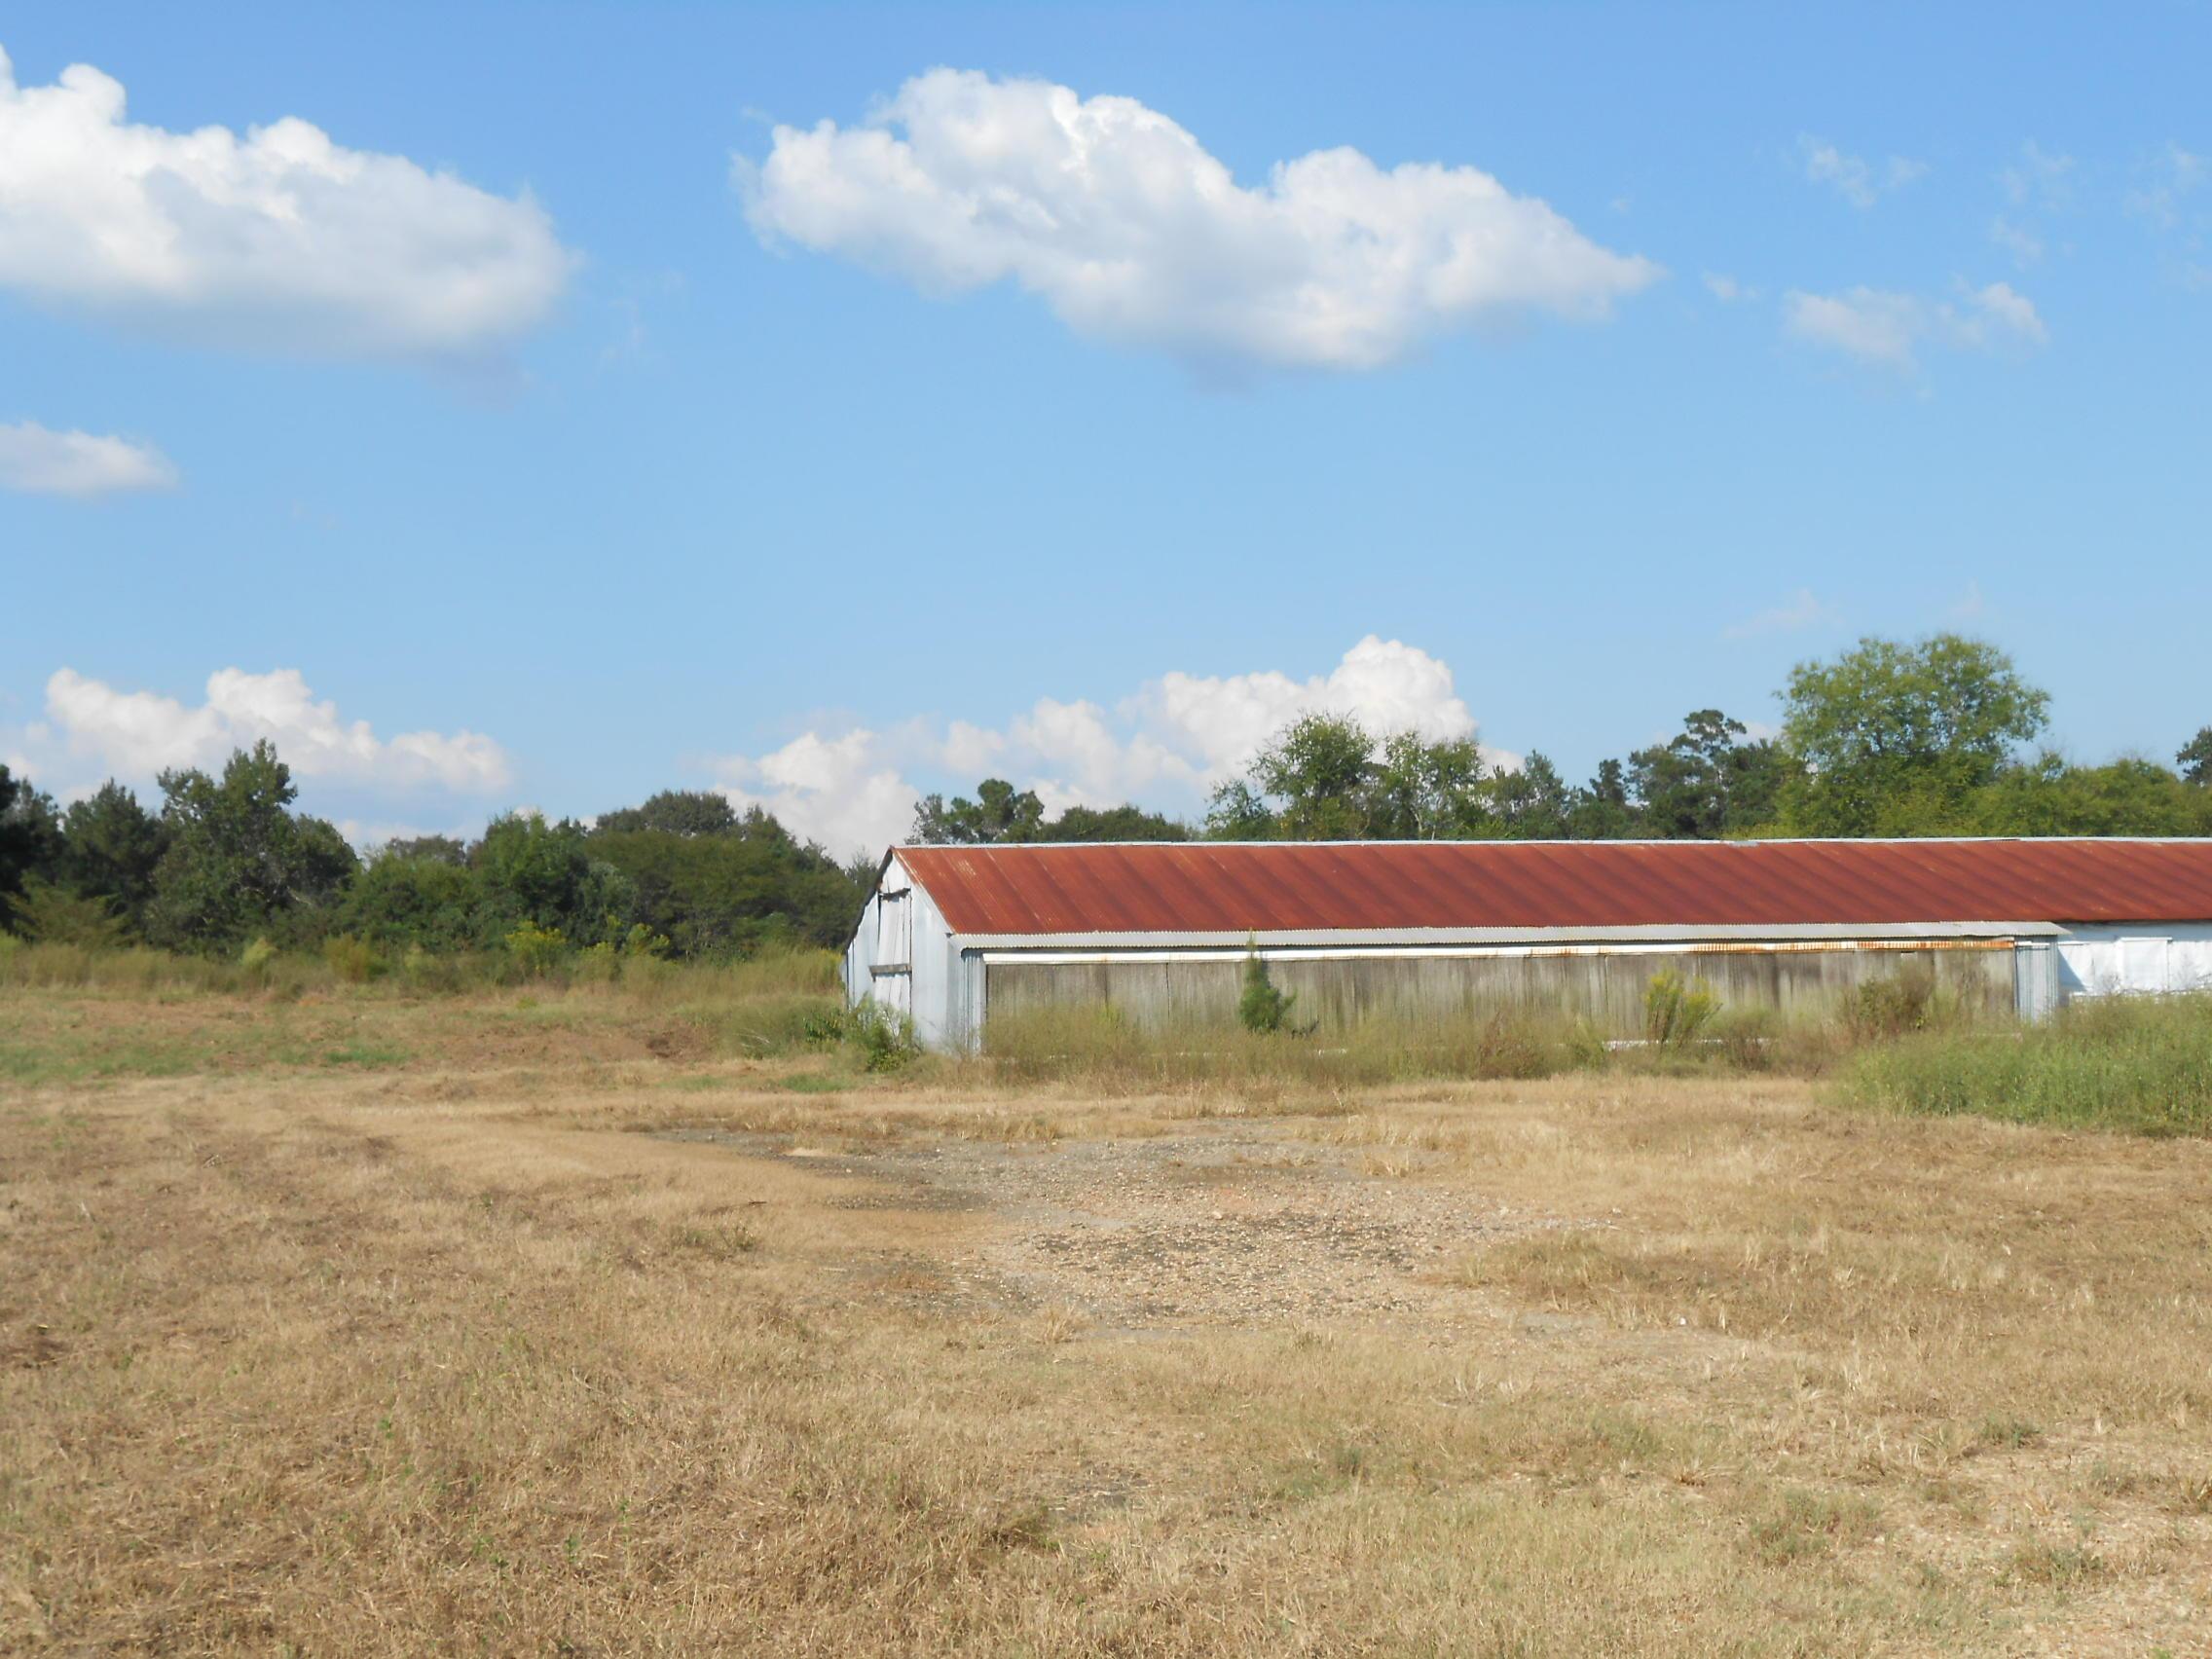 Anacoco land for sale,  1643 Good Hope Rd., Anacoco LA - $199,000